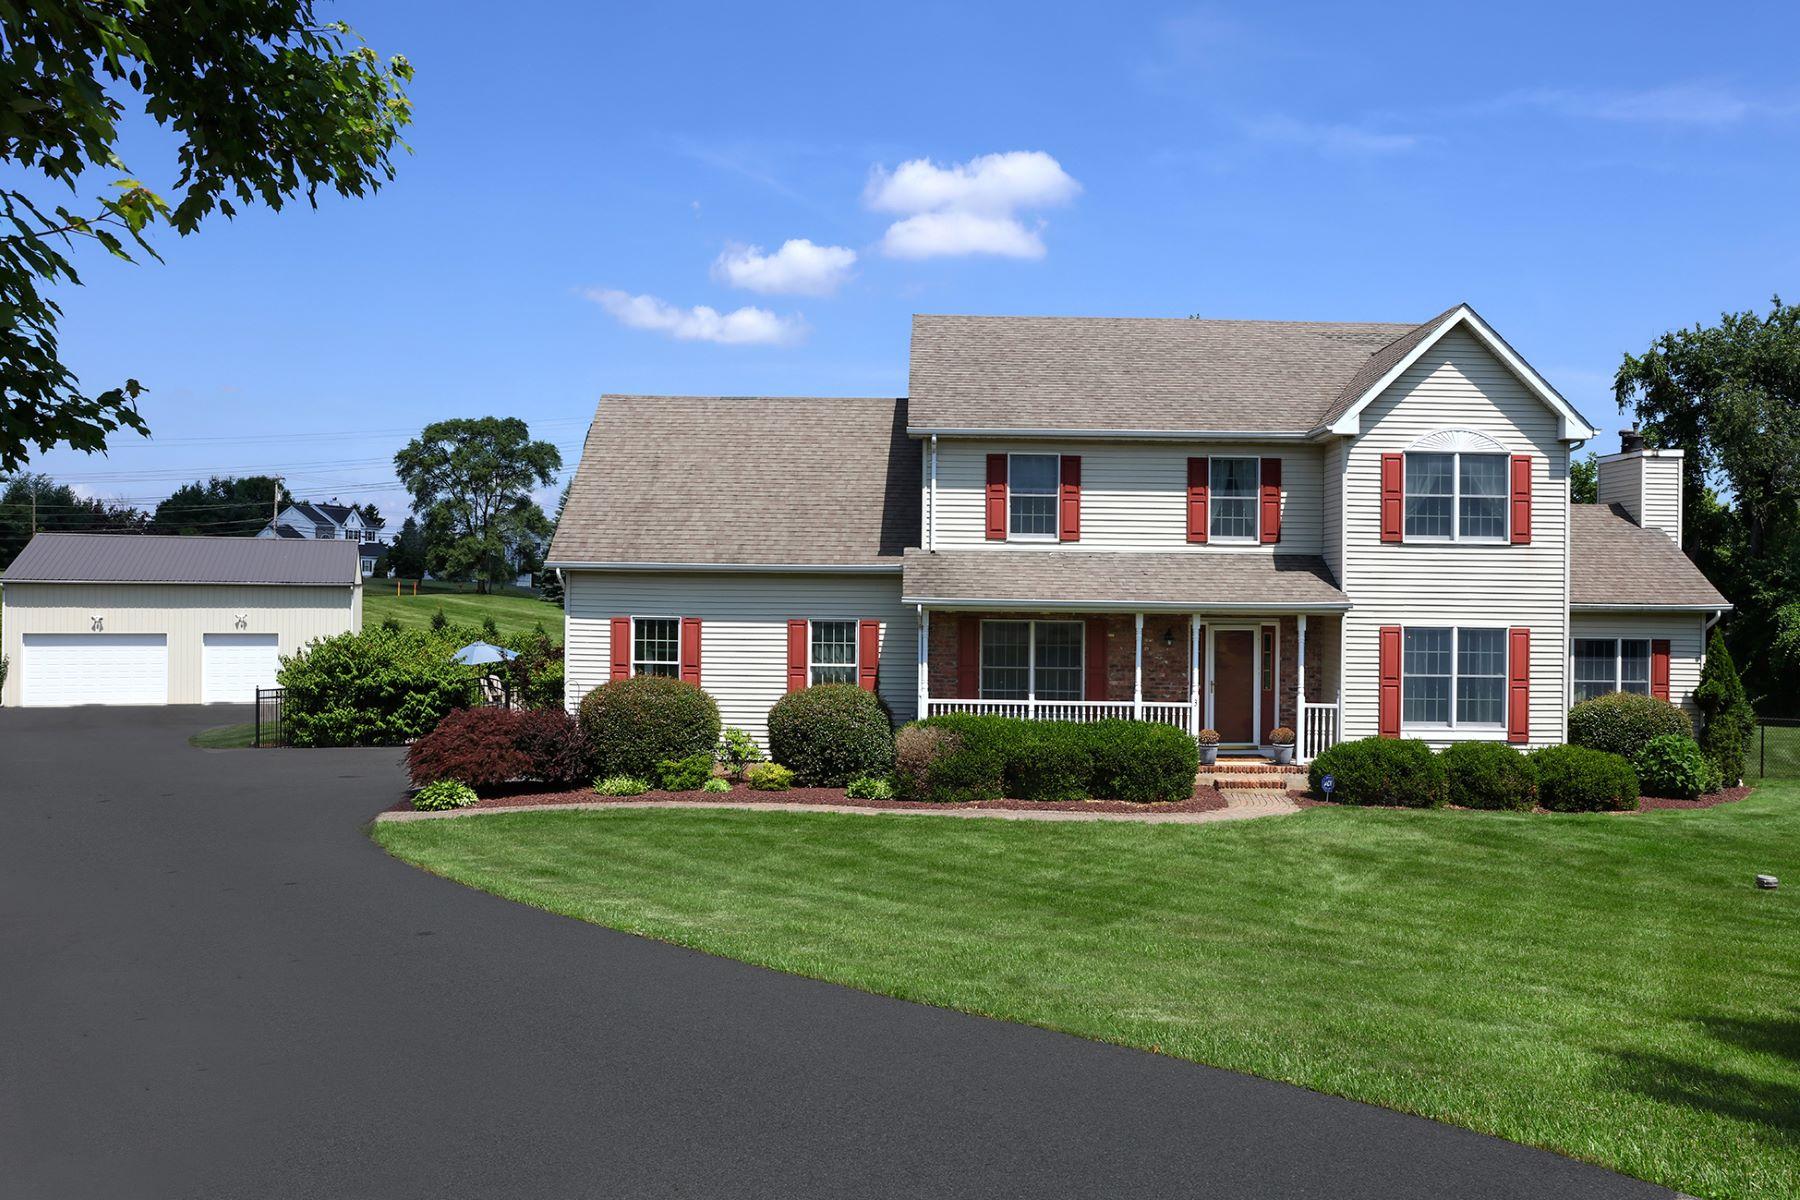 独户住宅 为 销售 在 Charming and Sophisticated Country Colonial 3 Calvin Court, 夫雷明顿, 新泽西州 08822 美国在/周边: Raritan Township